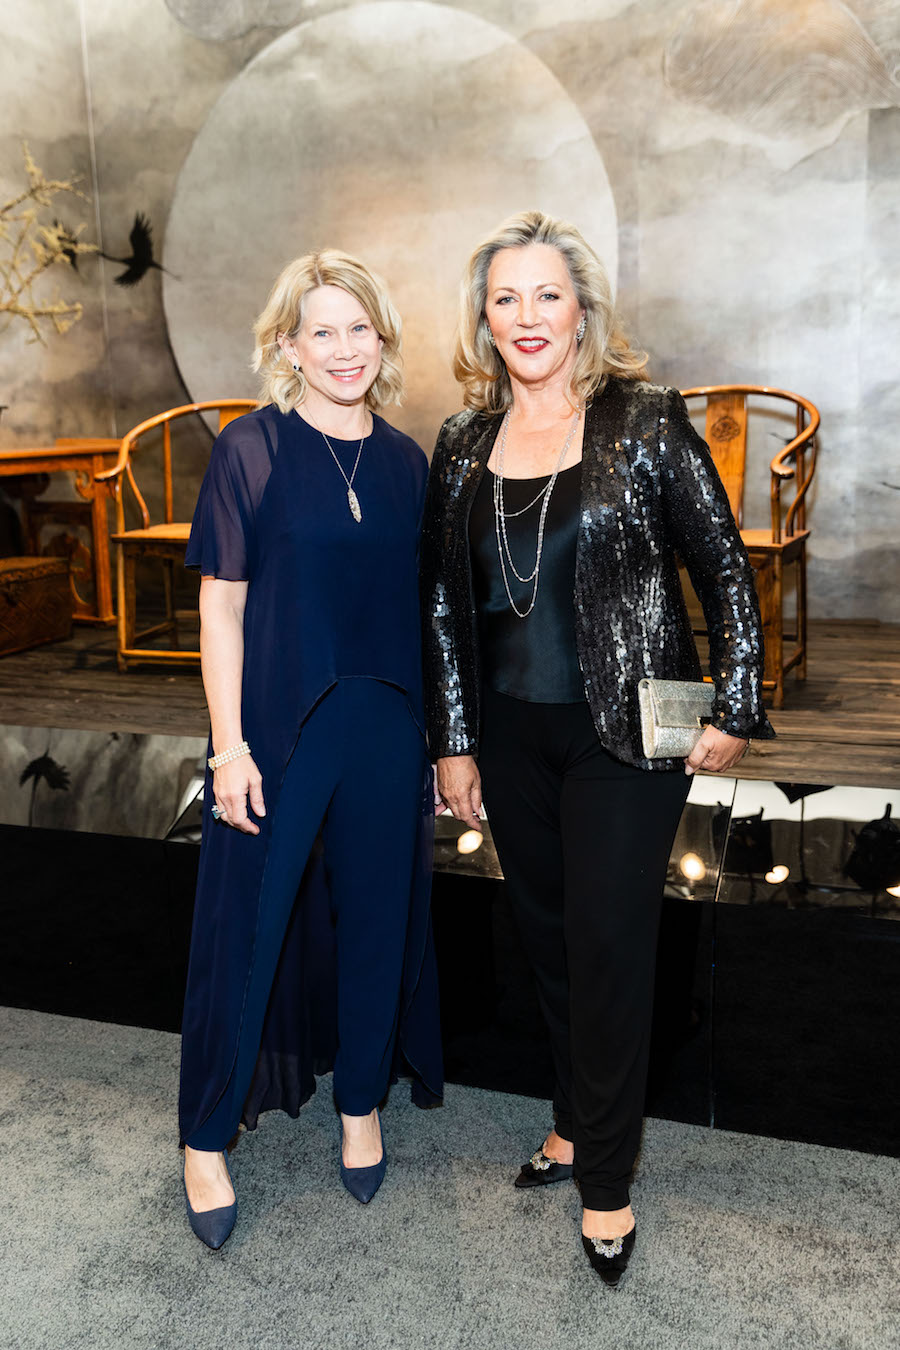 Ariane Trimuschat and Suzanne Tucker